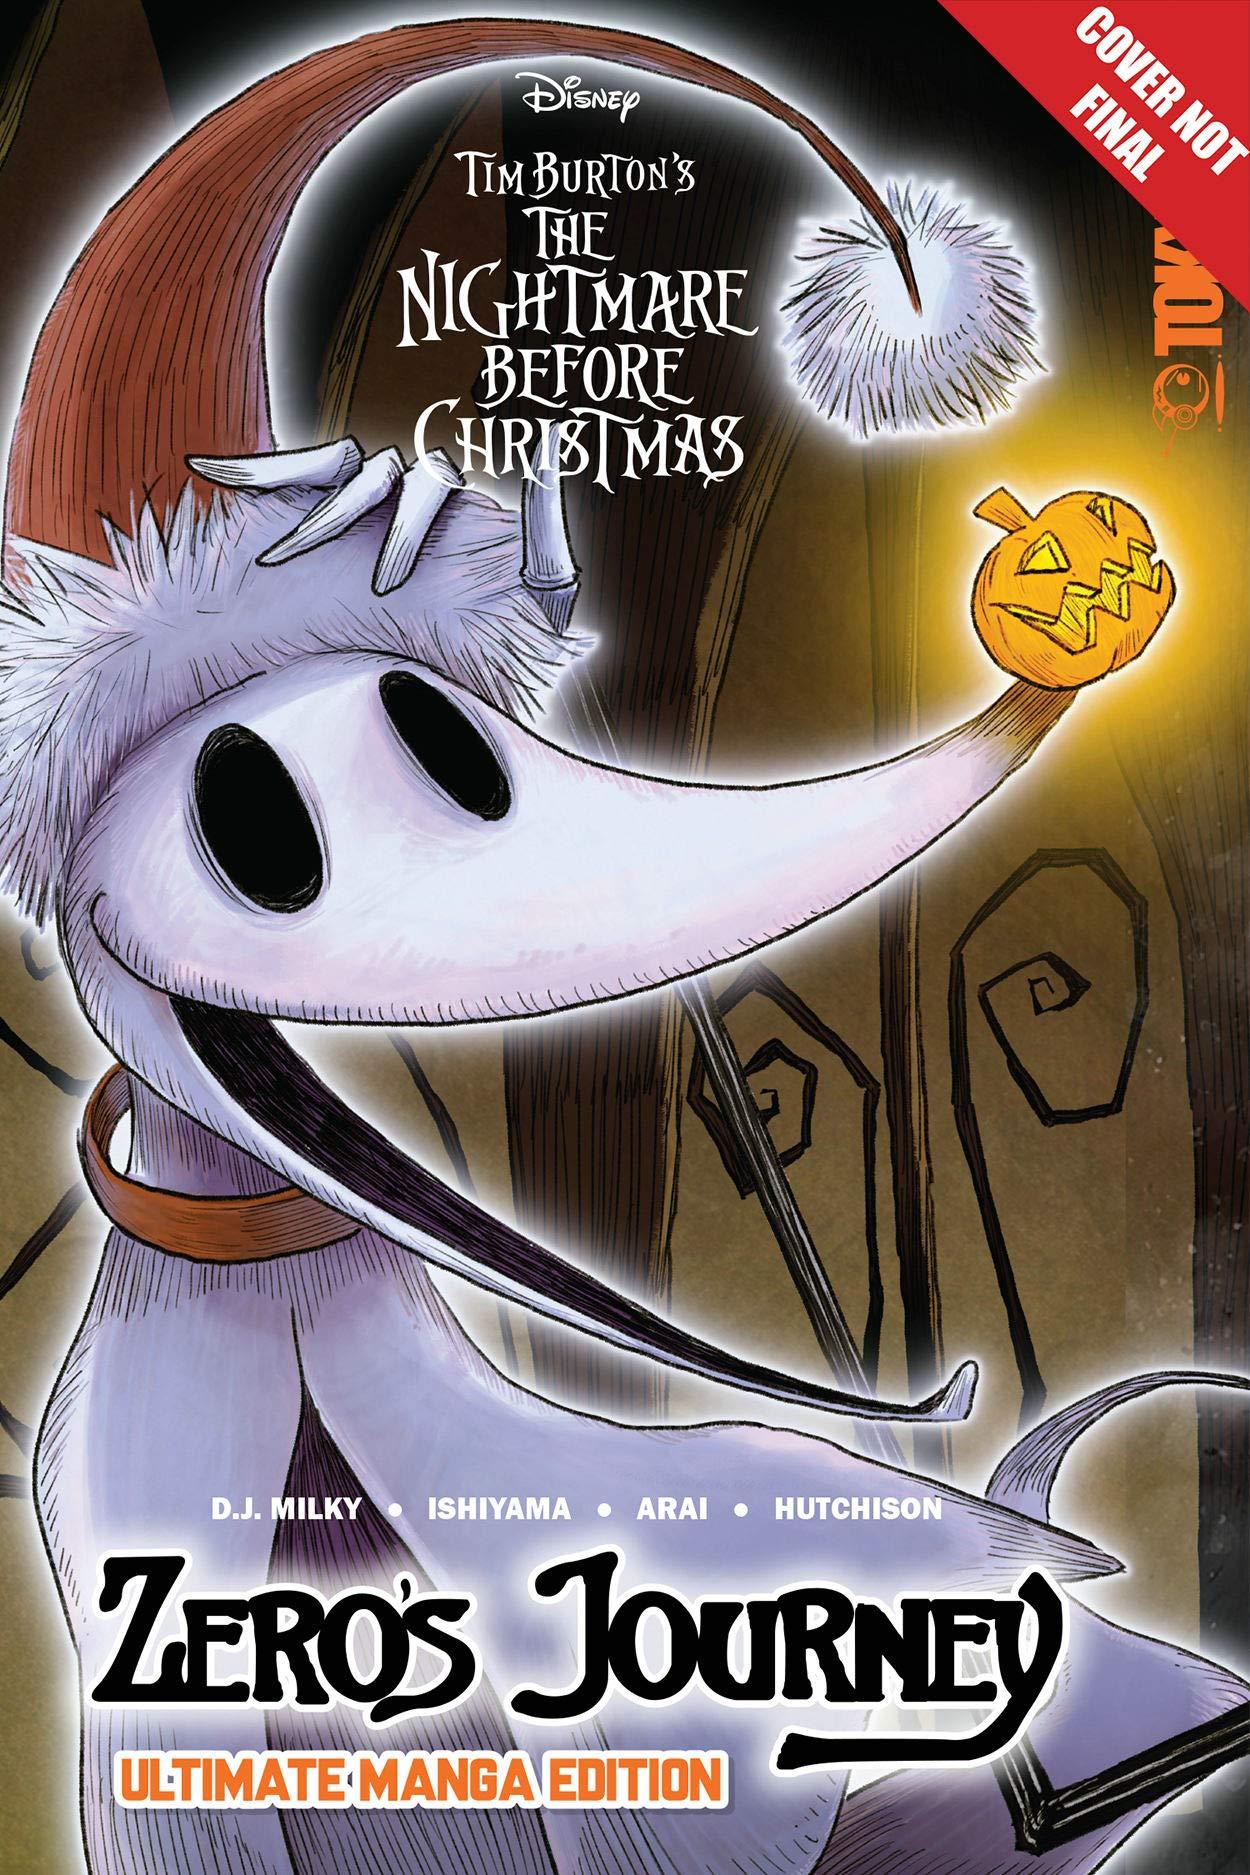 The Nightmare Before Christmas Manga 2020 Disney Manga: Tim Burton's The Nightmare Before Christmas   Zero's